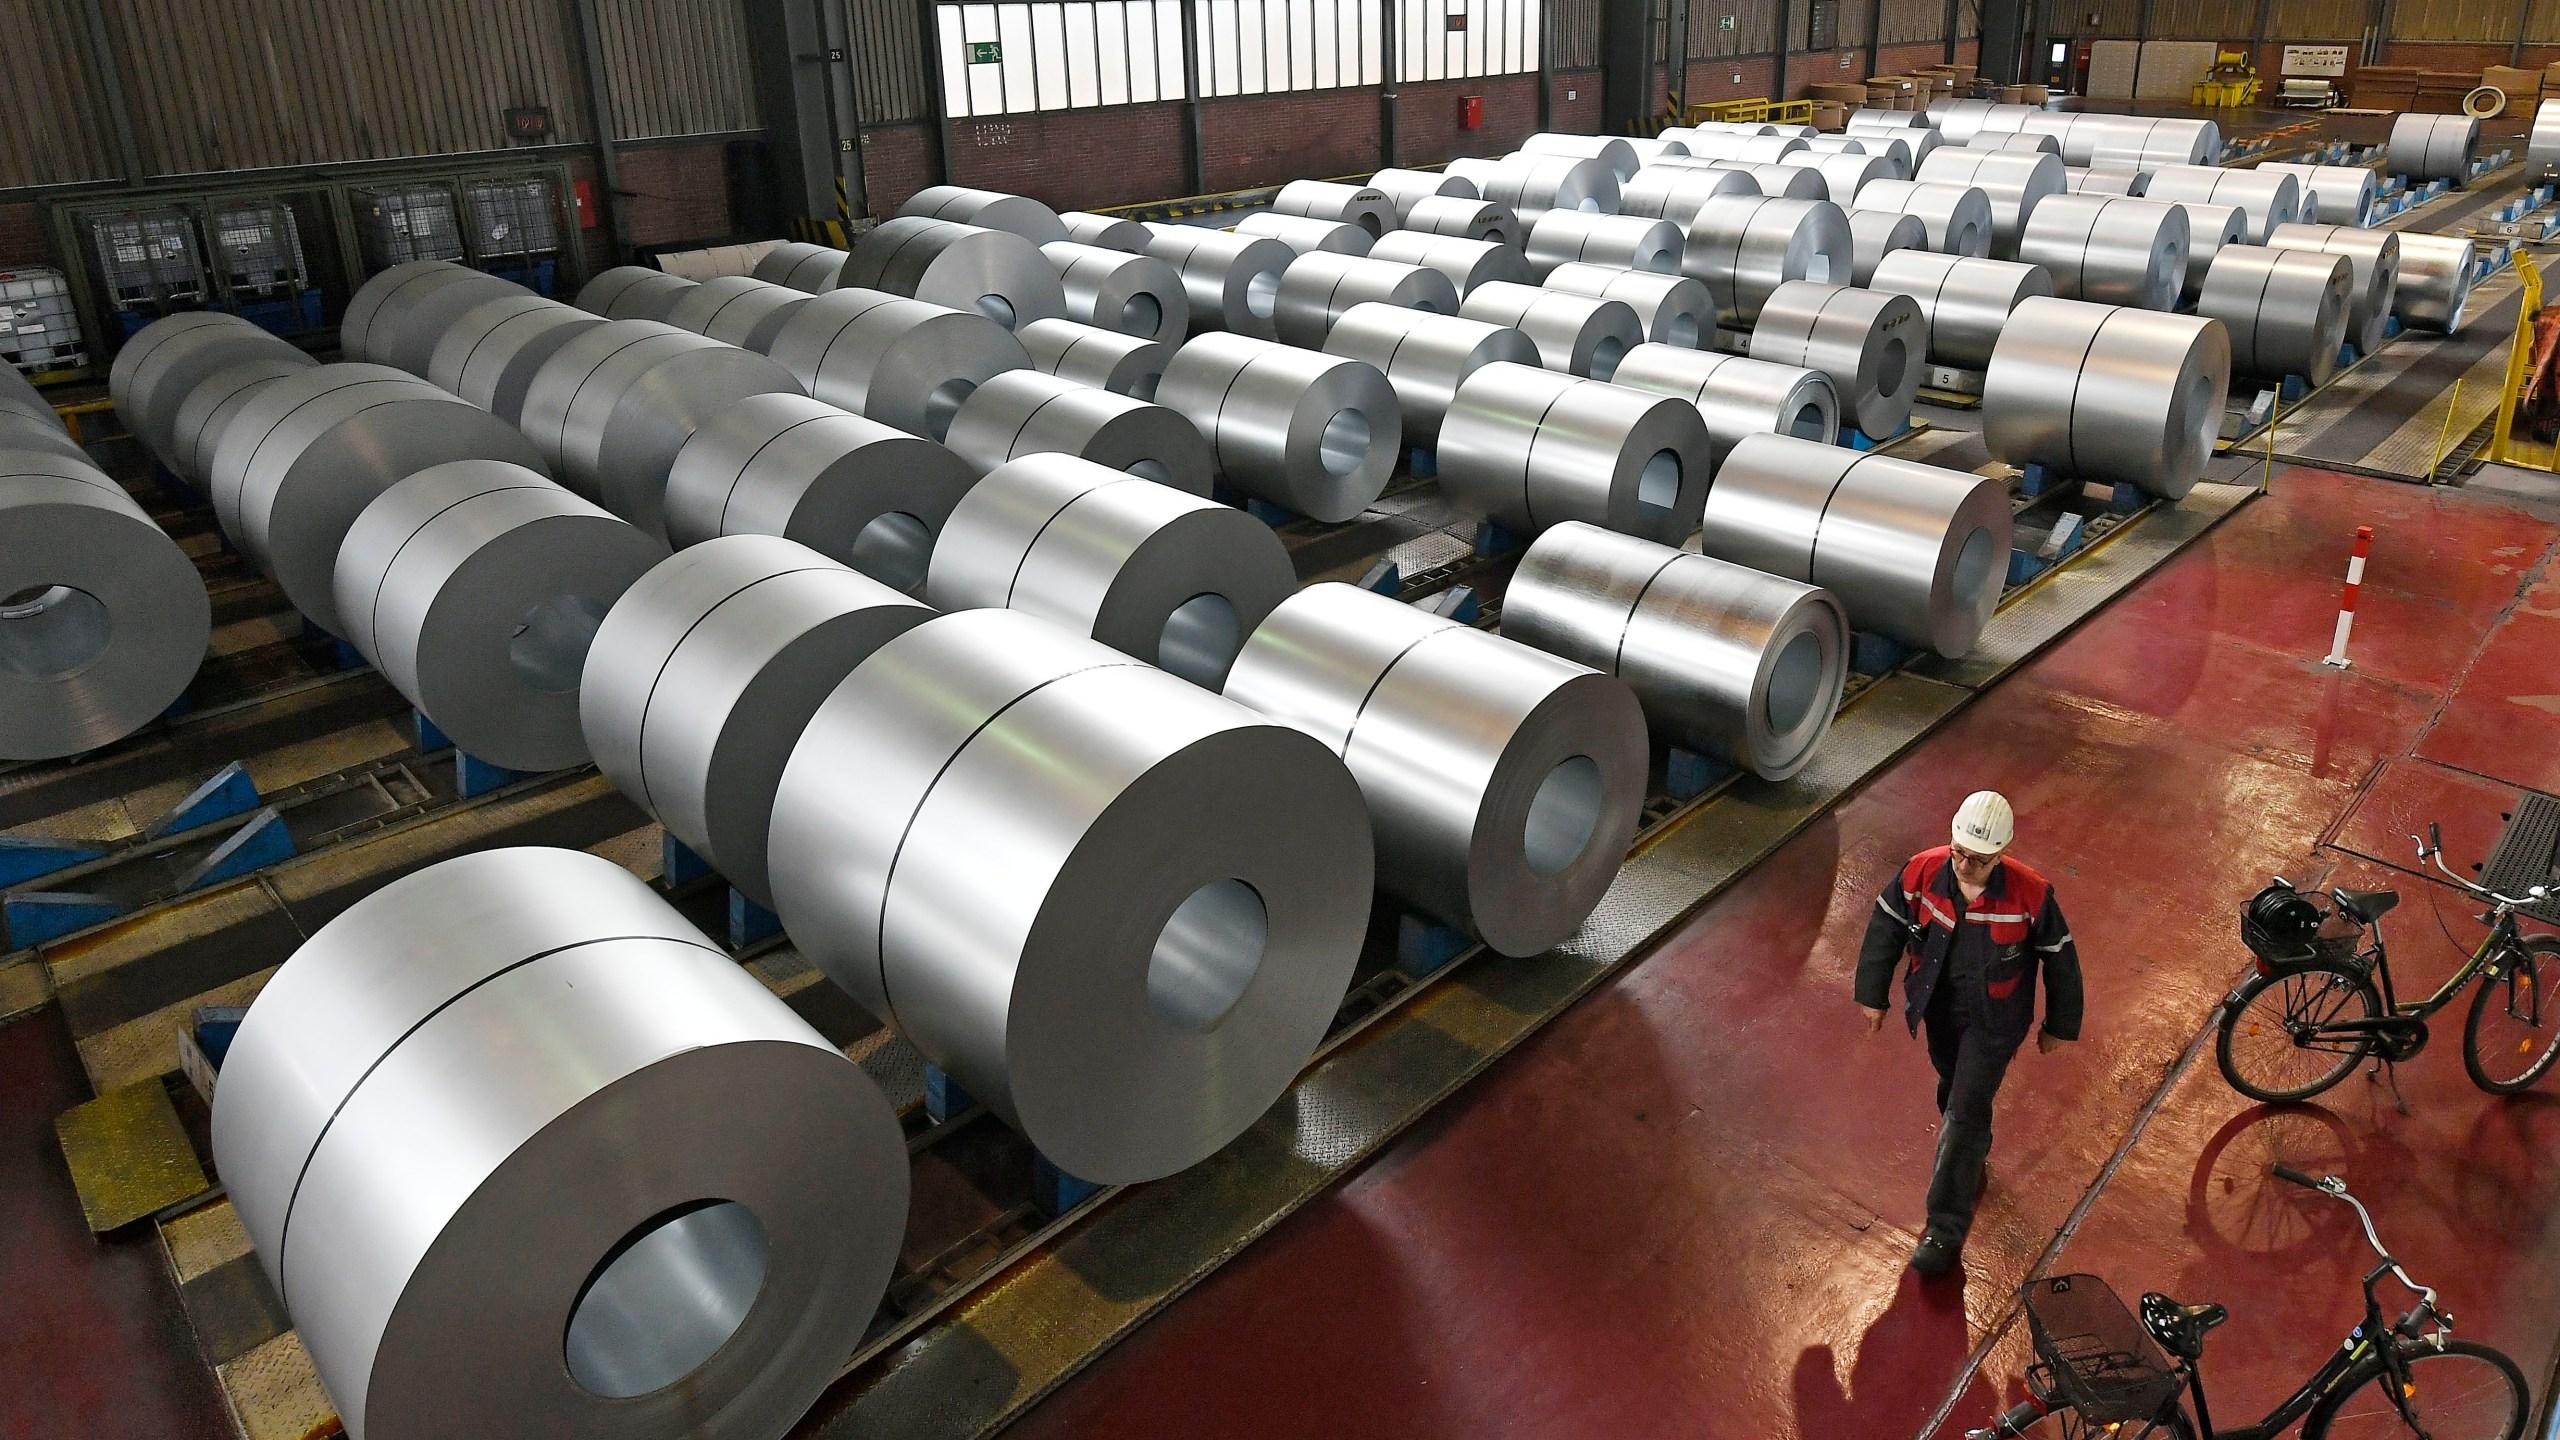 Germany_US_Steel_Tariffs_13862-159532.jpg31030994